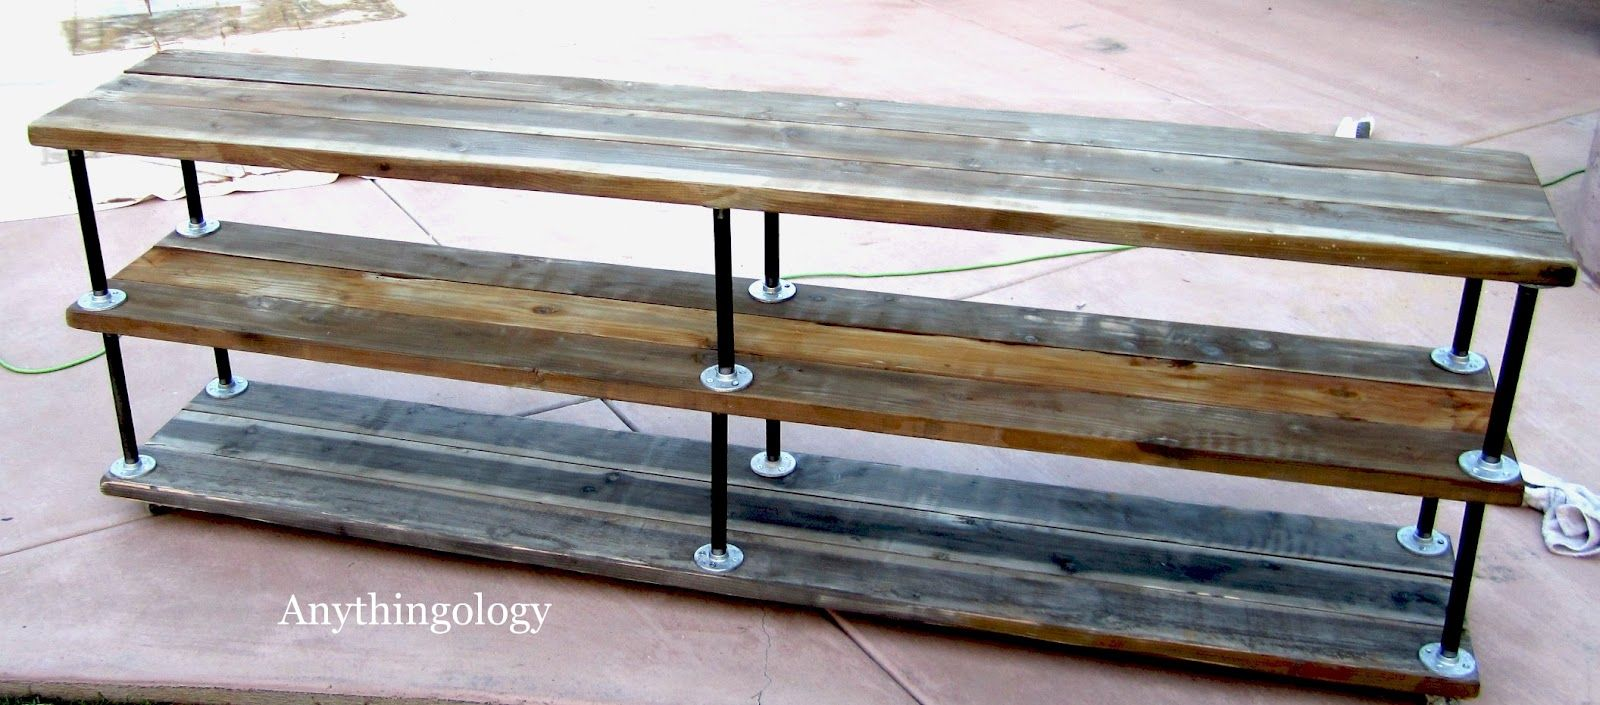 Diy industrial shelves little home diy projects for Industrial diy projects